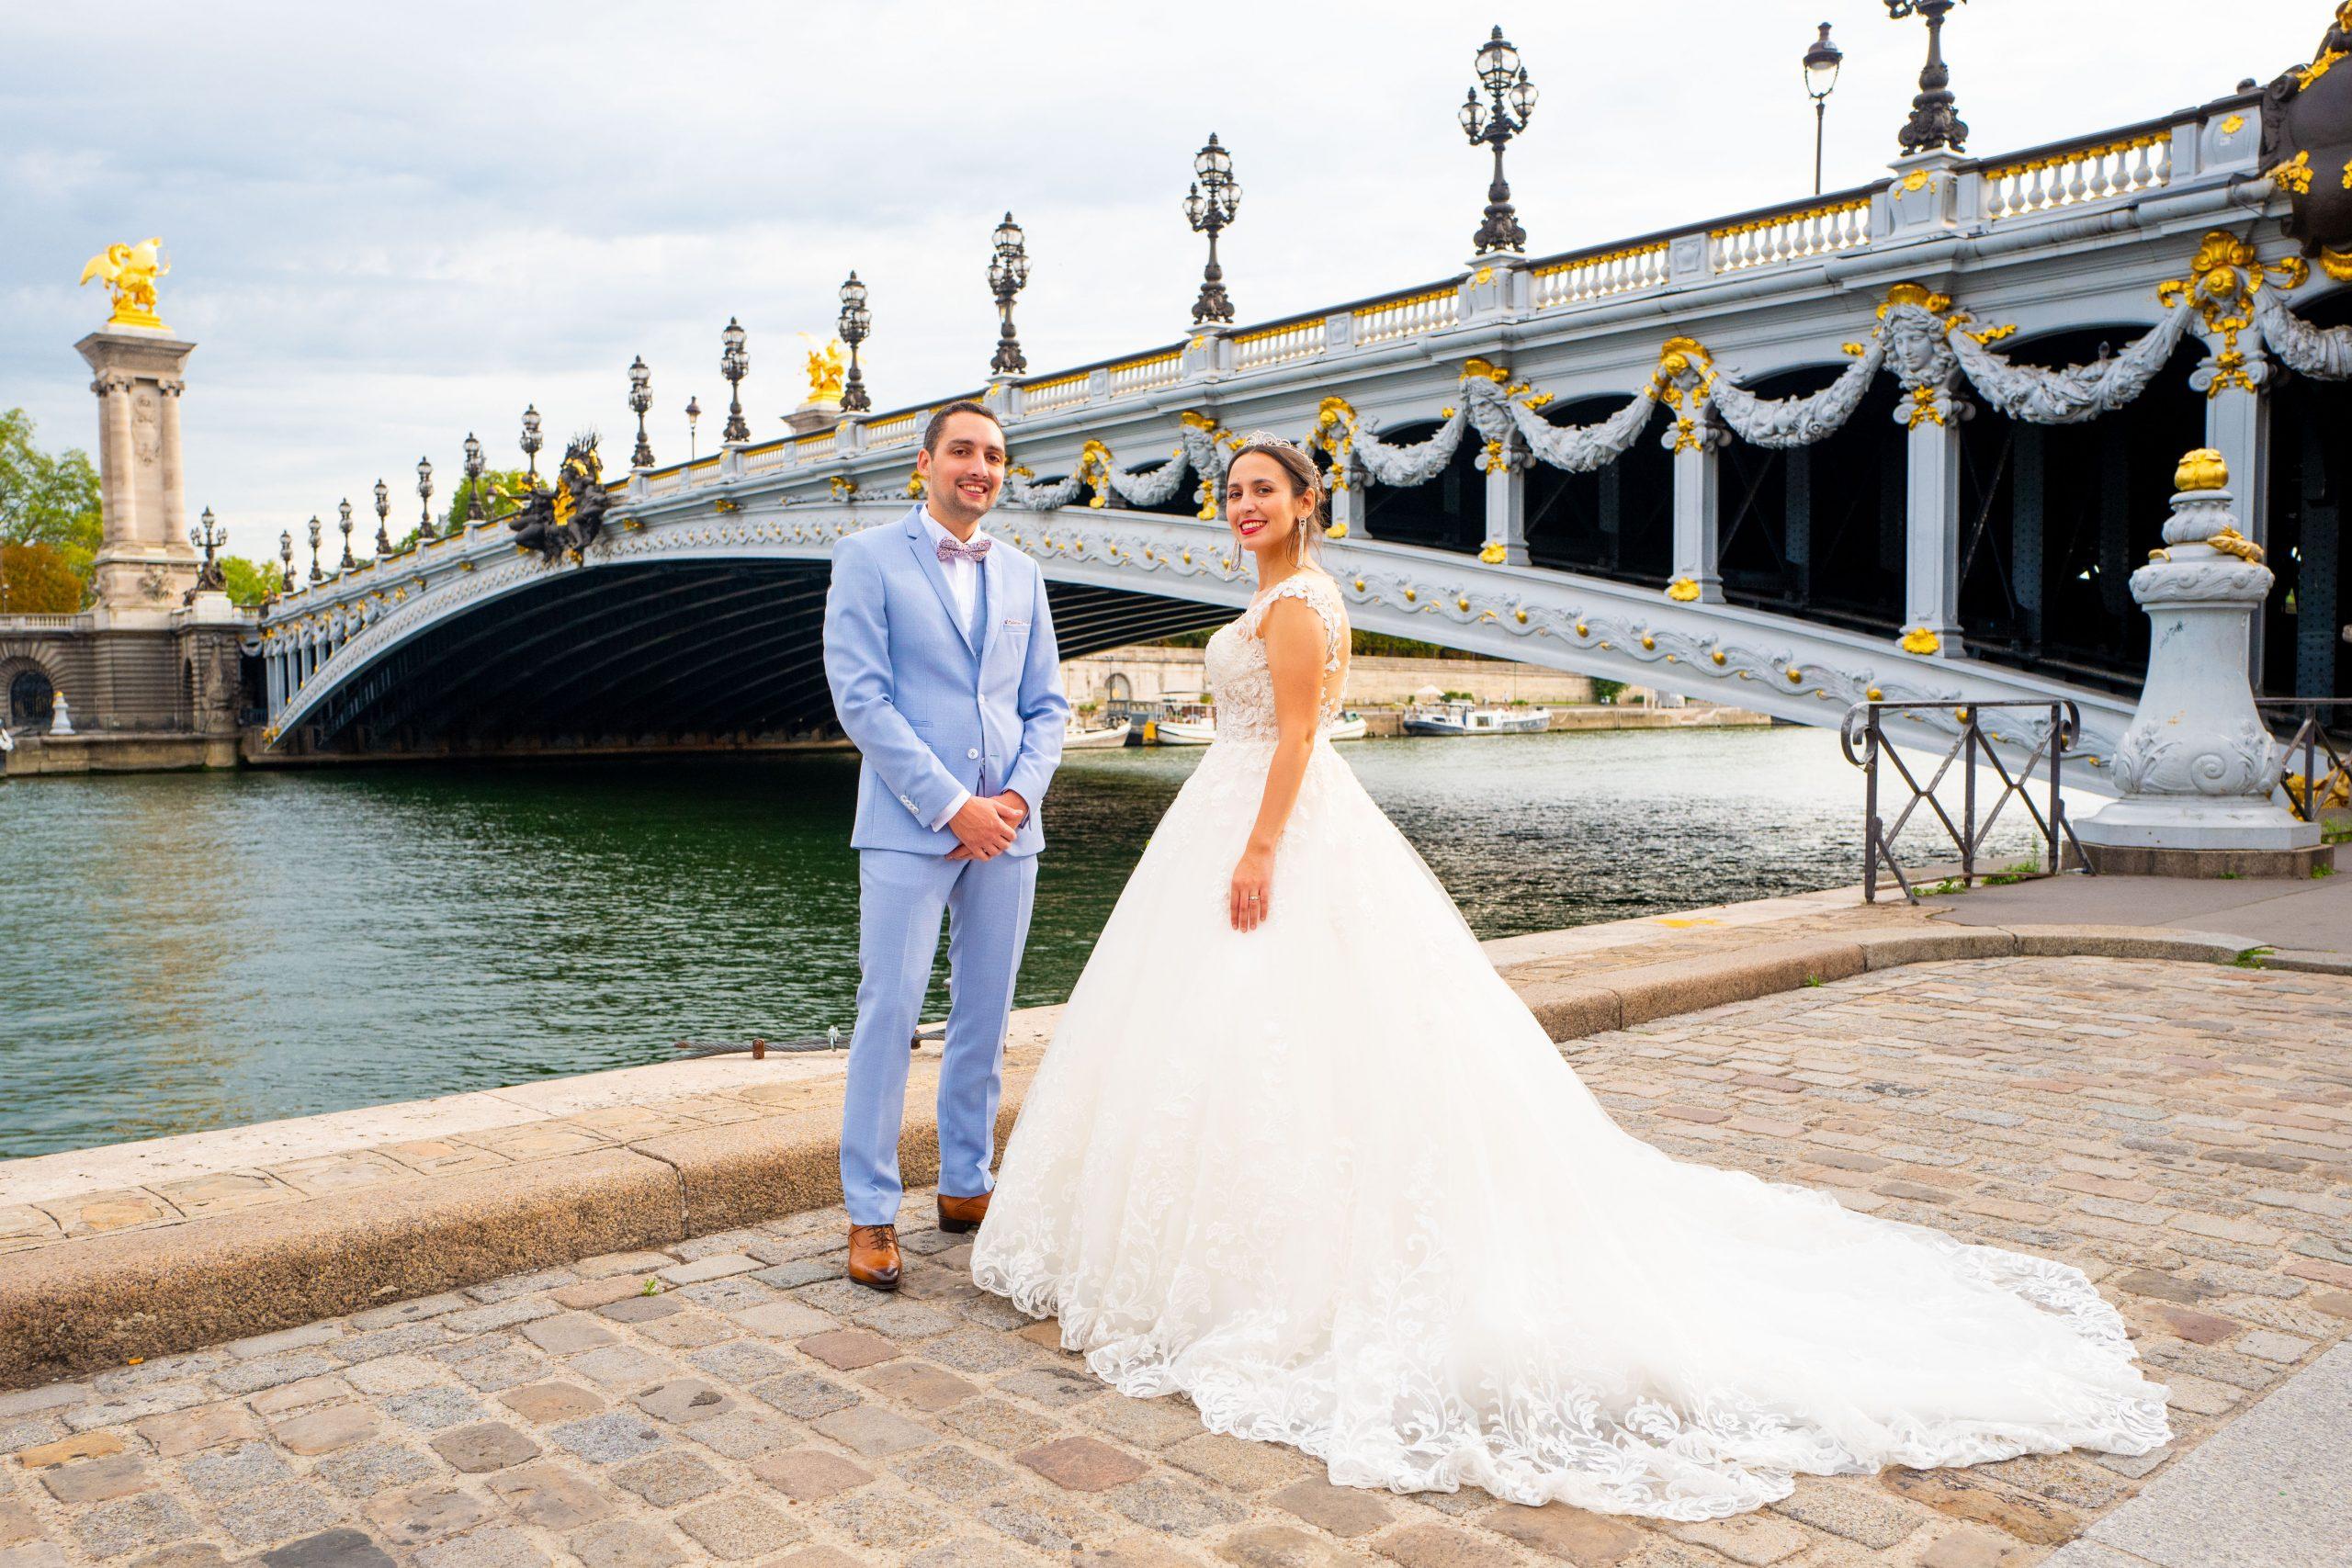 Mariage Paris - Photographe mariage Paris original - Séance couple Pont Alexandre III -